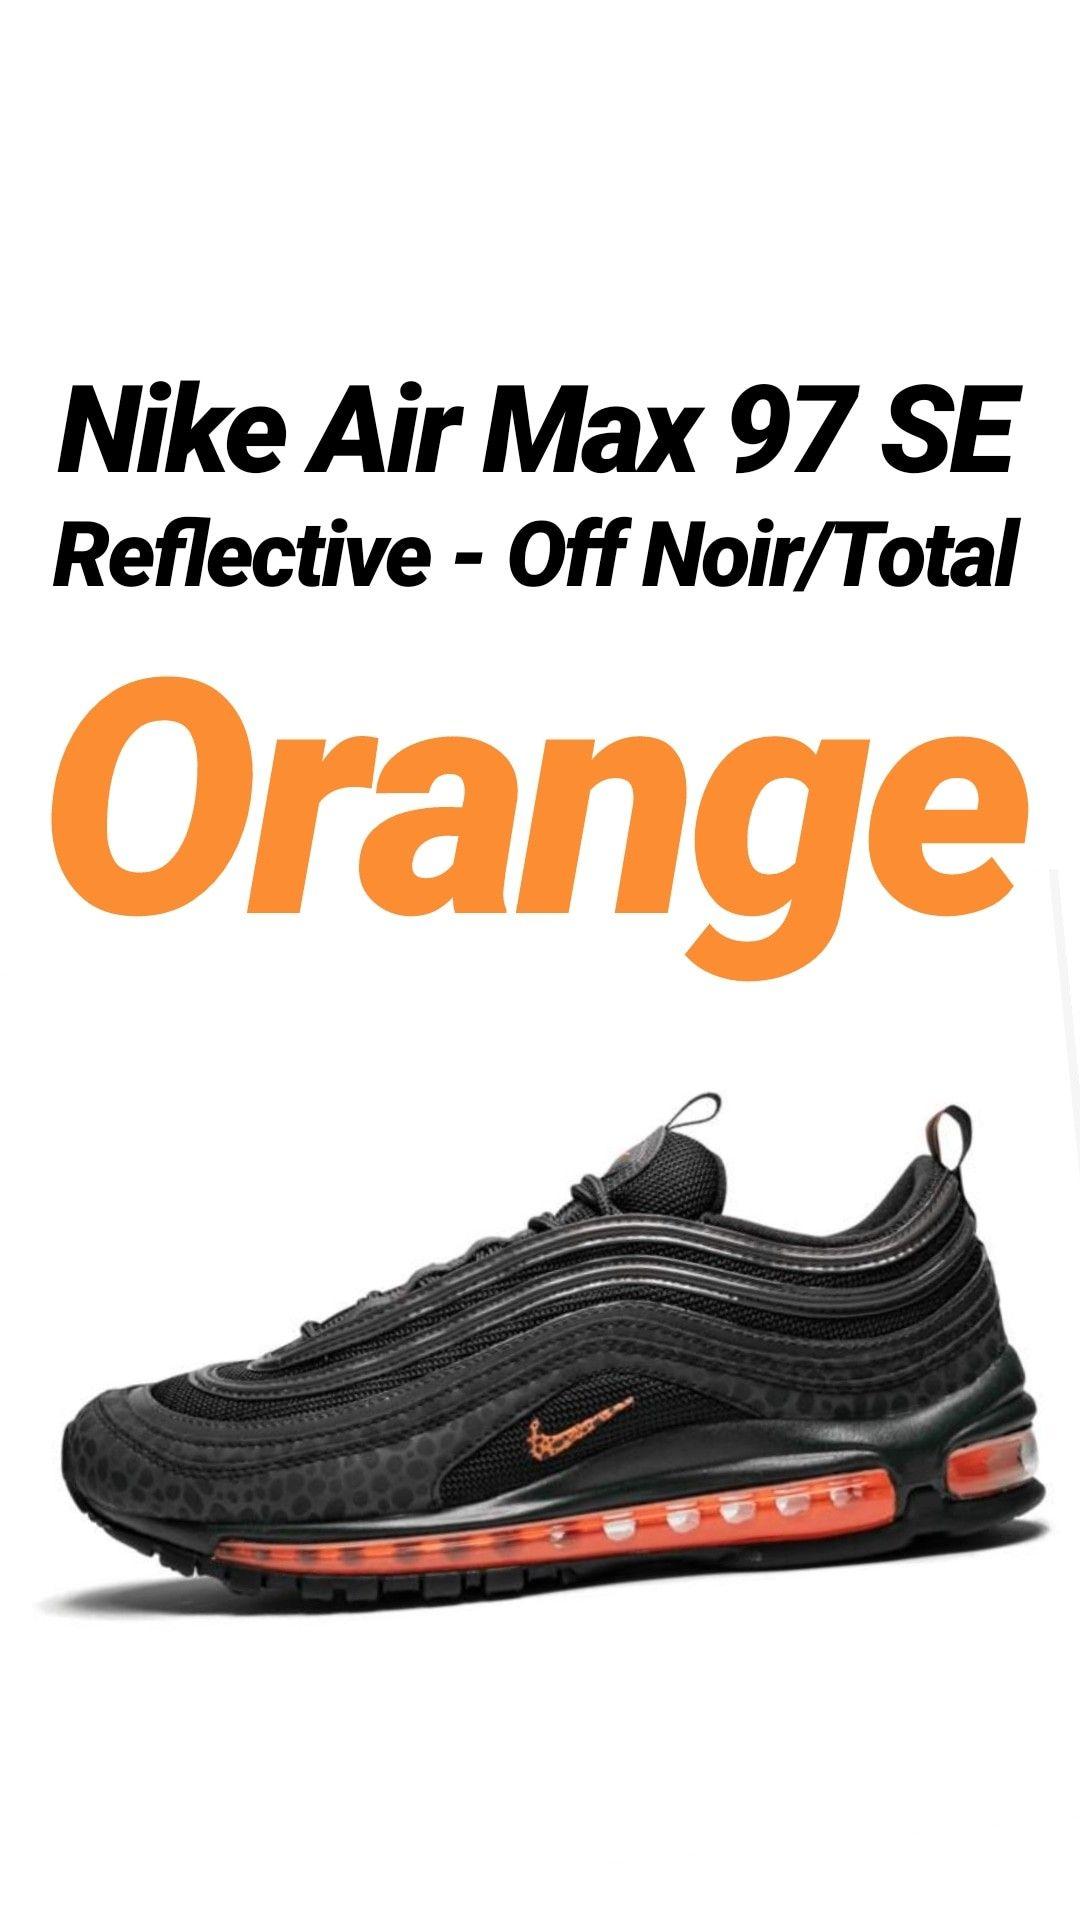 Nike Air Max 97 SE Reflective BQ6524 001